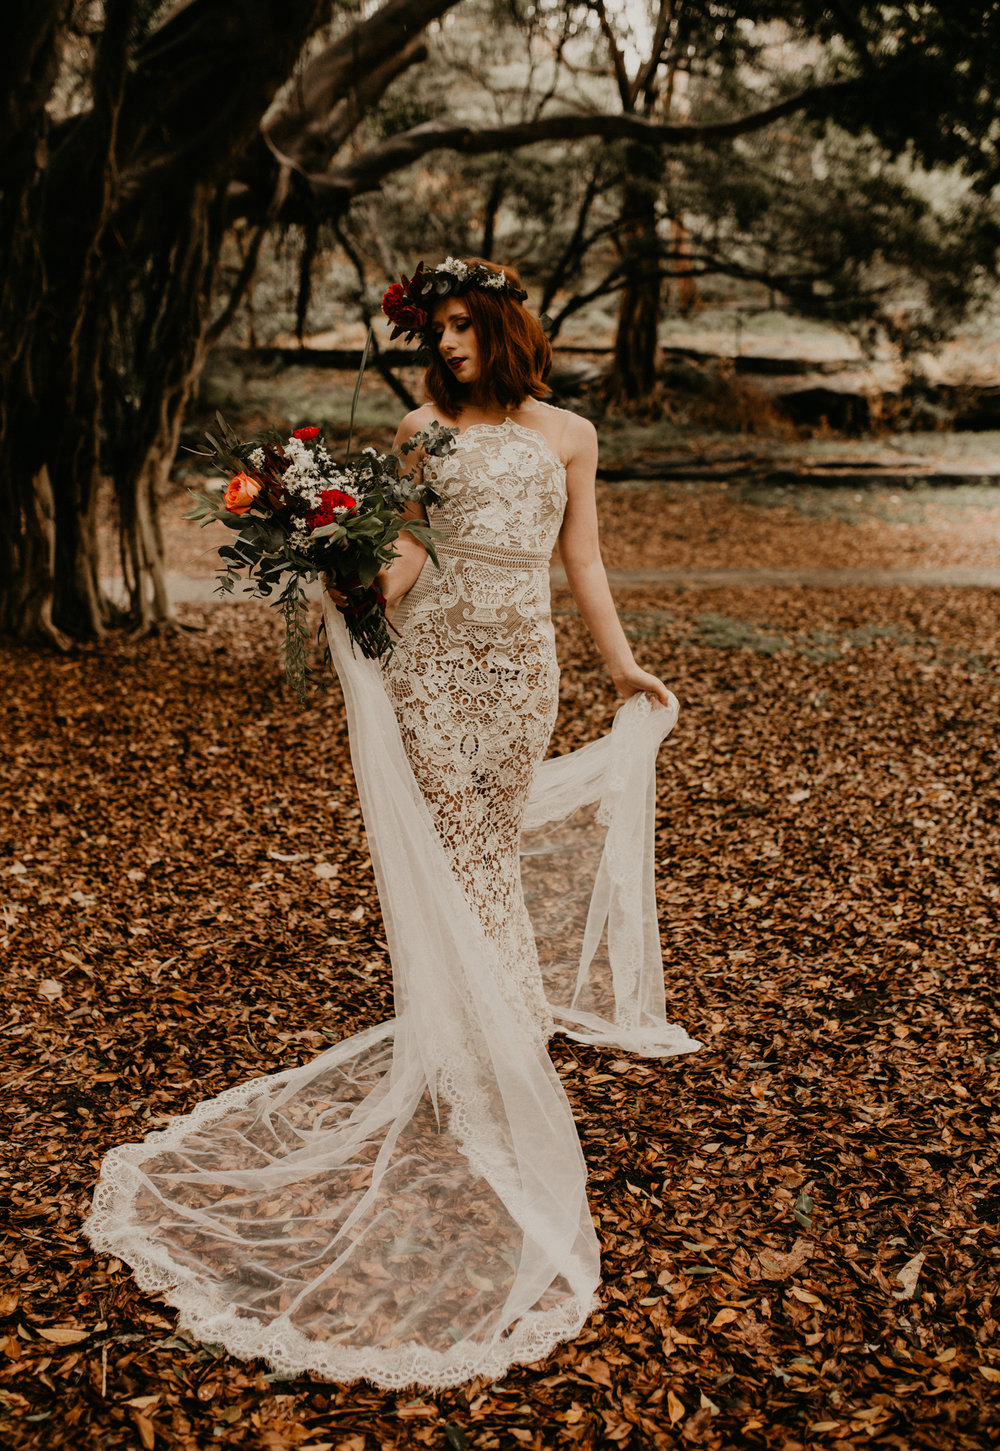 Nielsen Park Rustic Bridal Sydney-10.jpg